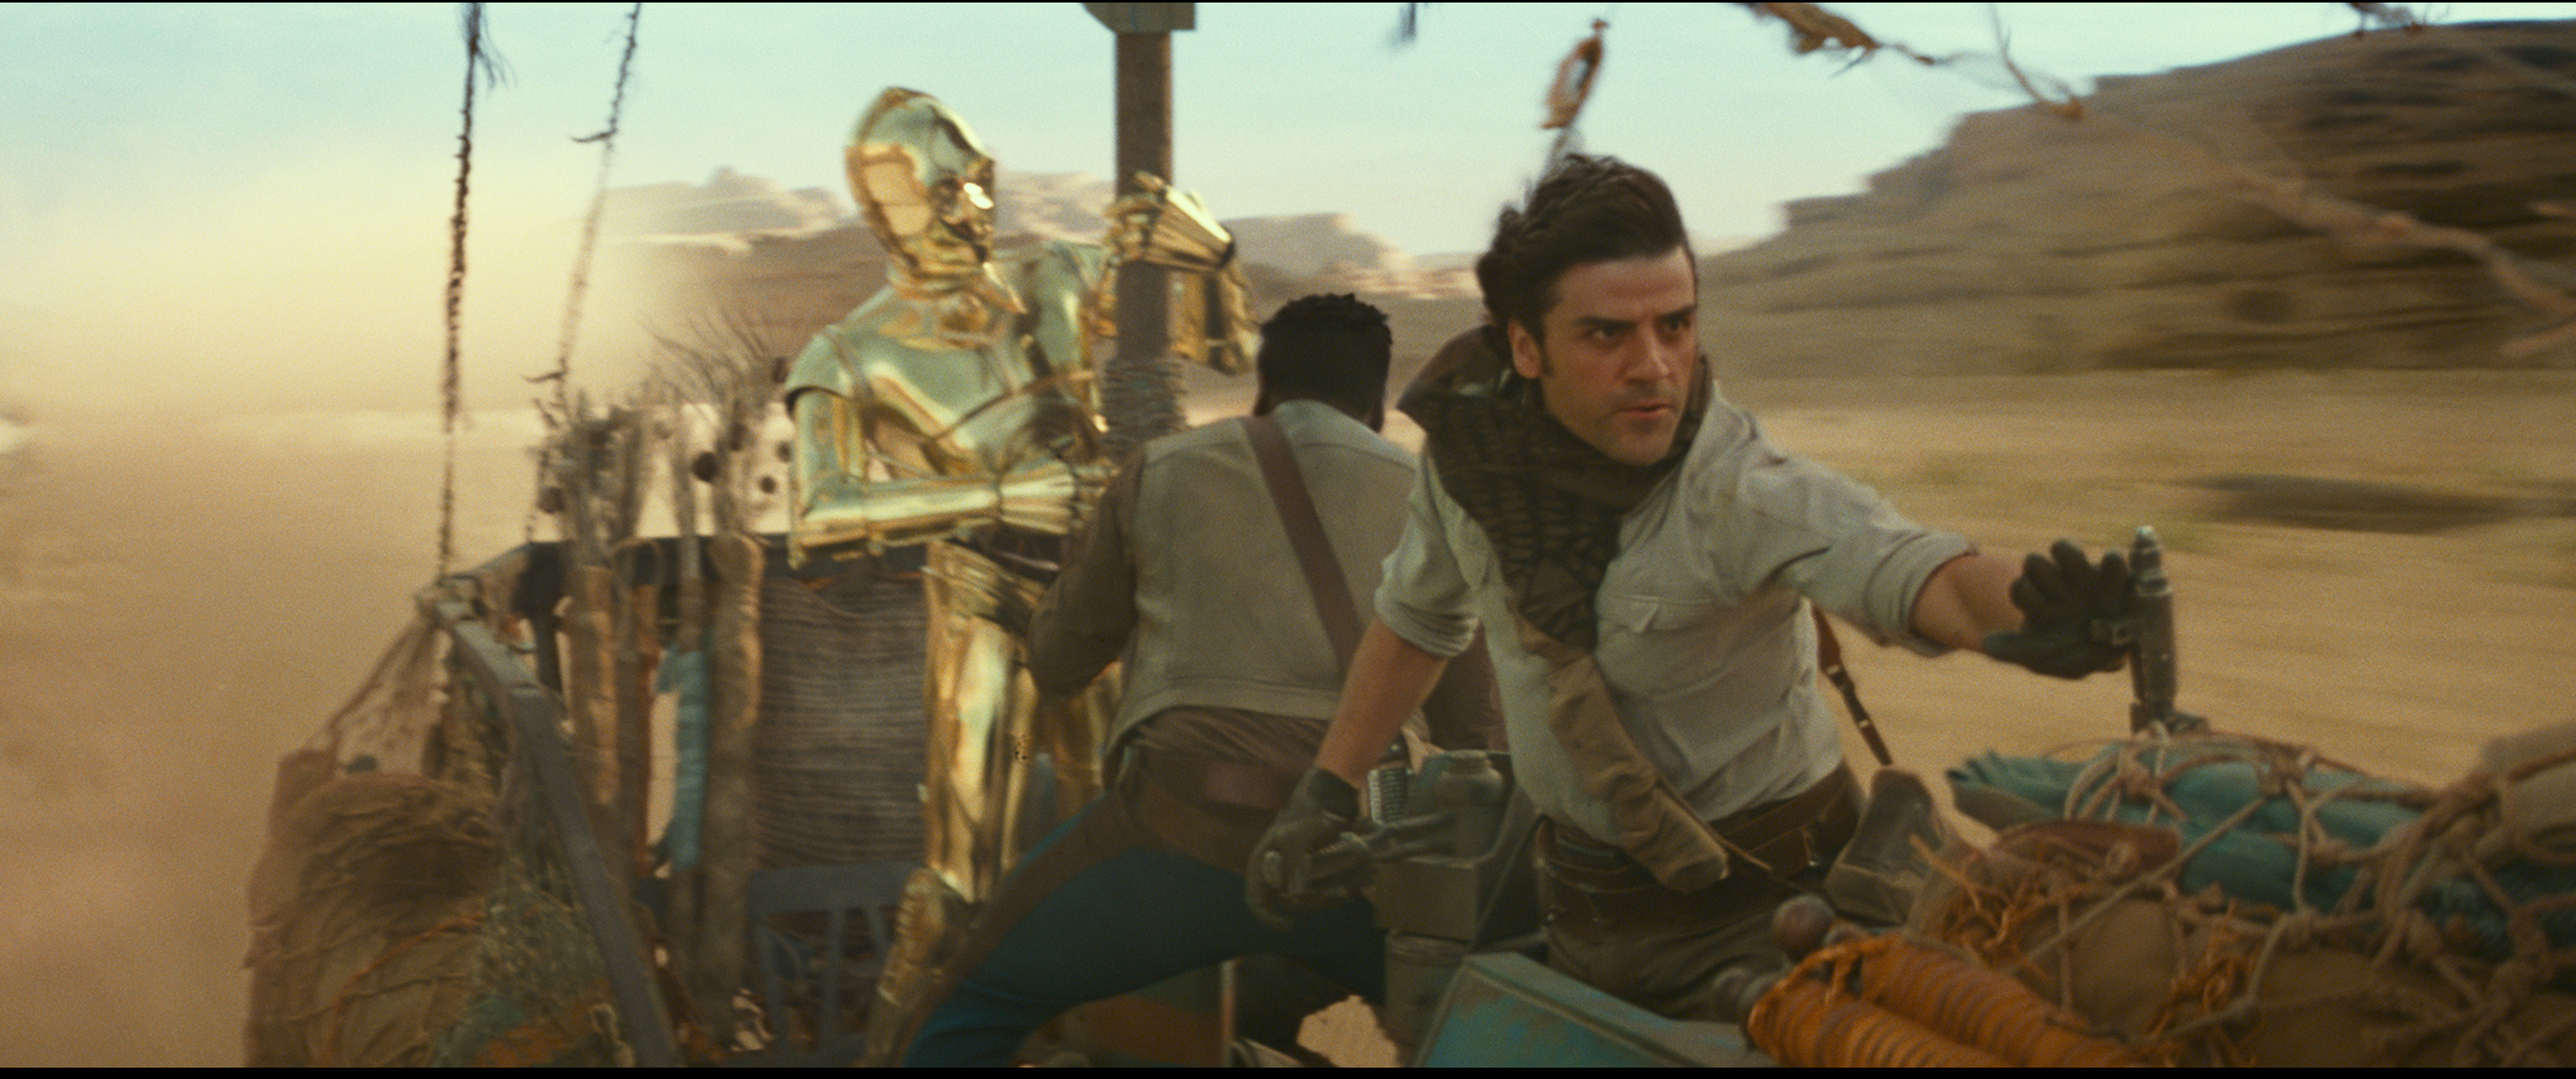 C3PO (Anthony Daniels), Finn (John Boyega) and Poe Dameron (Oscar Isaac) in STAR WARS:  EPISODE IX.